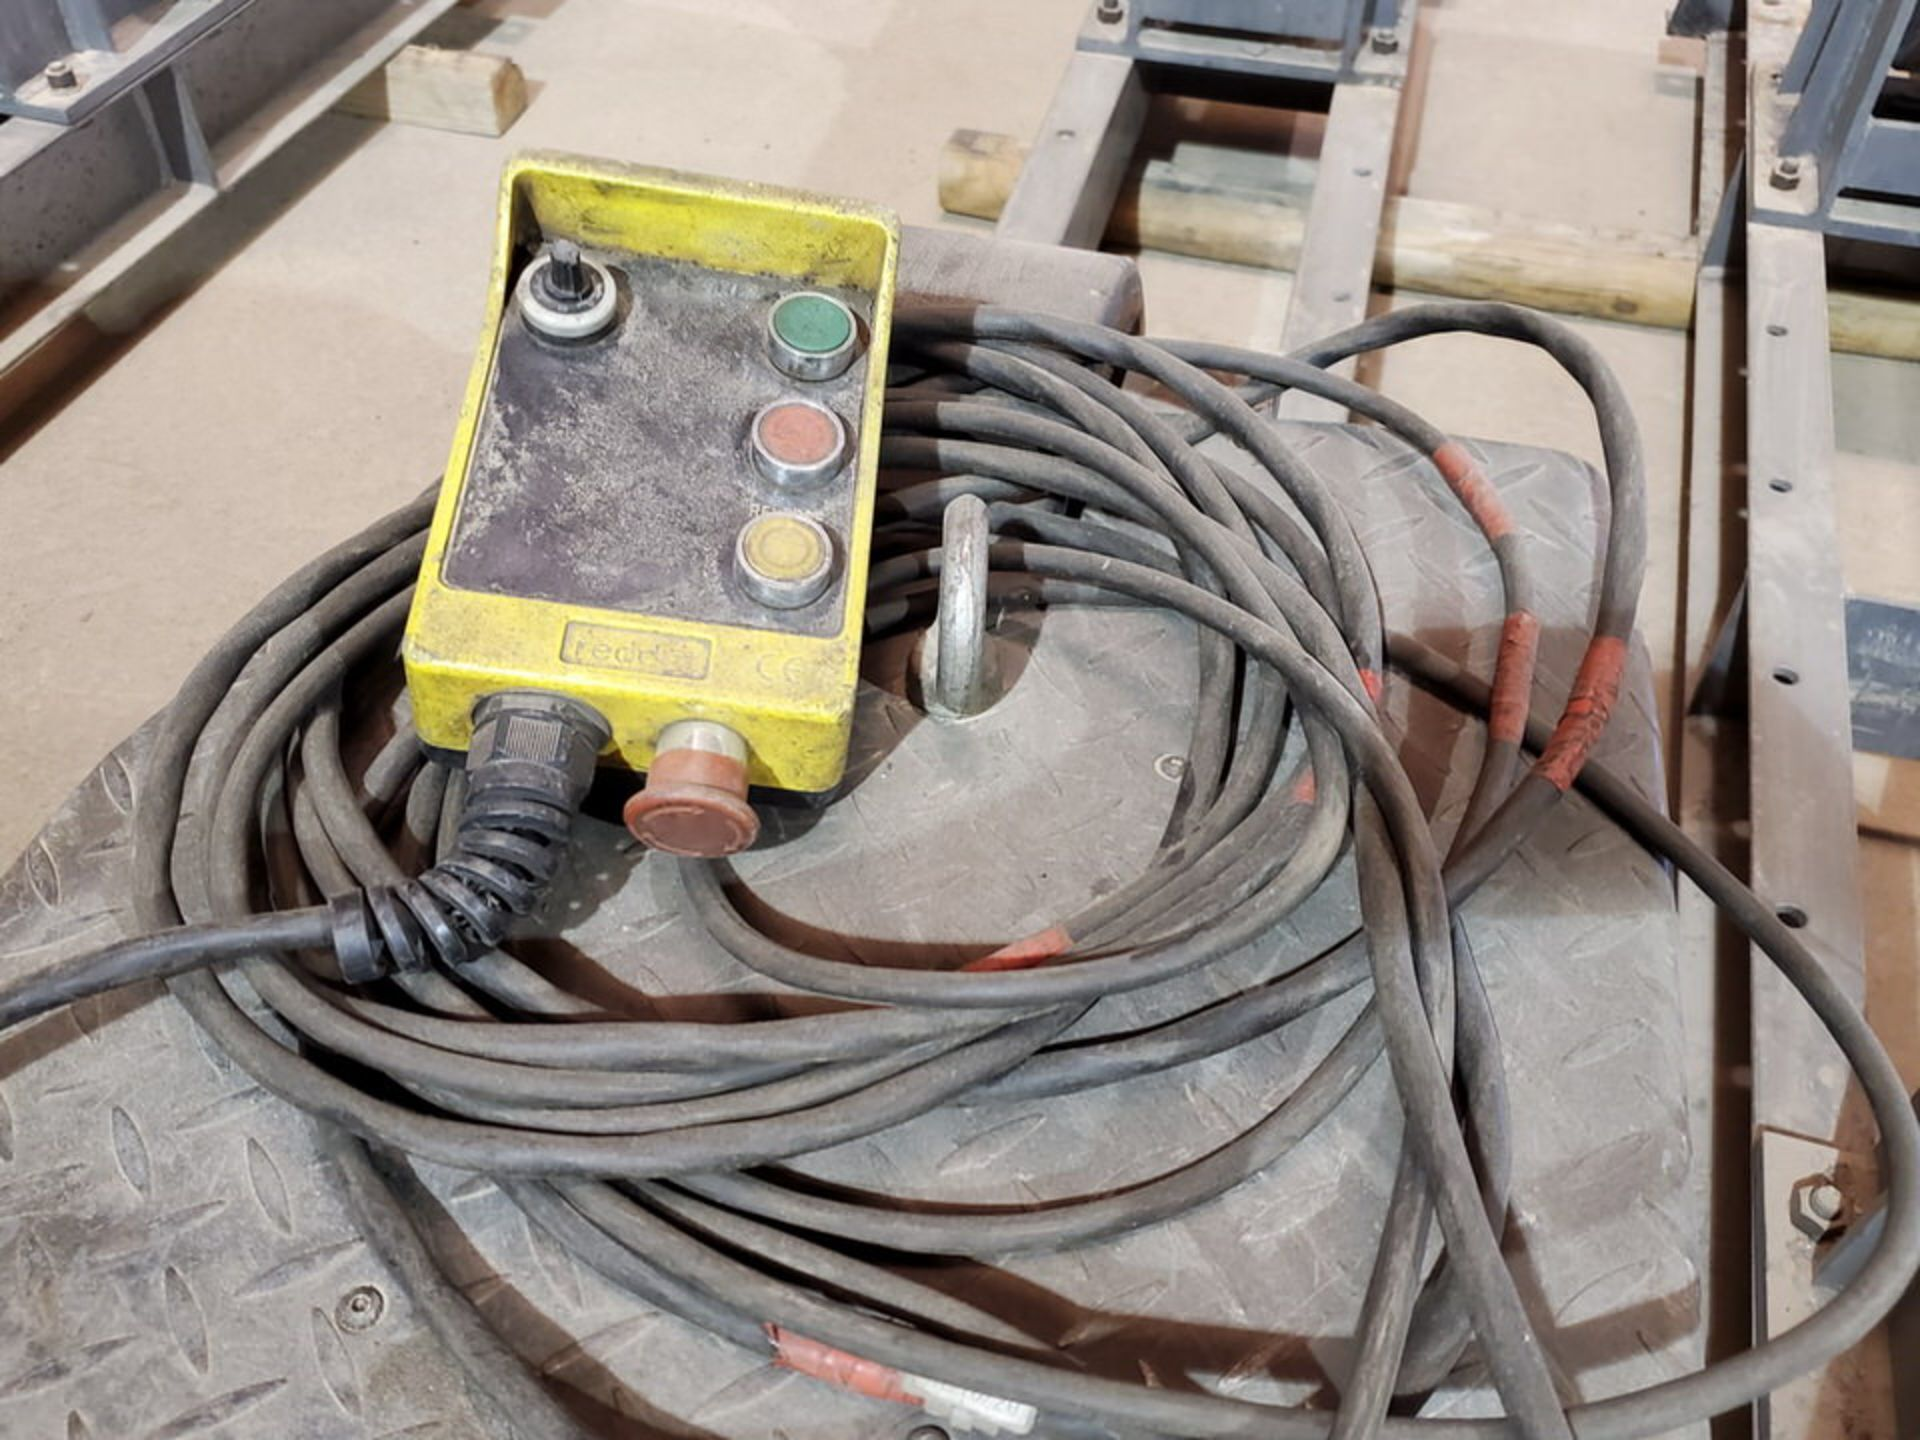 "Profax TR-20000 Turn Roll 10K Cap., 115V, 15A, 50/60HZ, 1PH, RPM: 0-1.9; 5"" Wheel Dia. - Image 7 of 8"